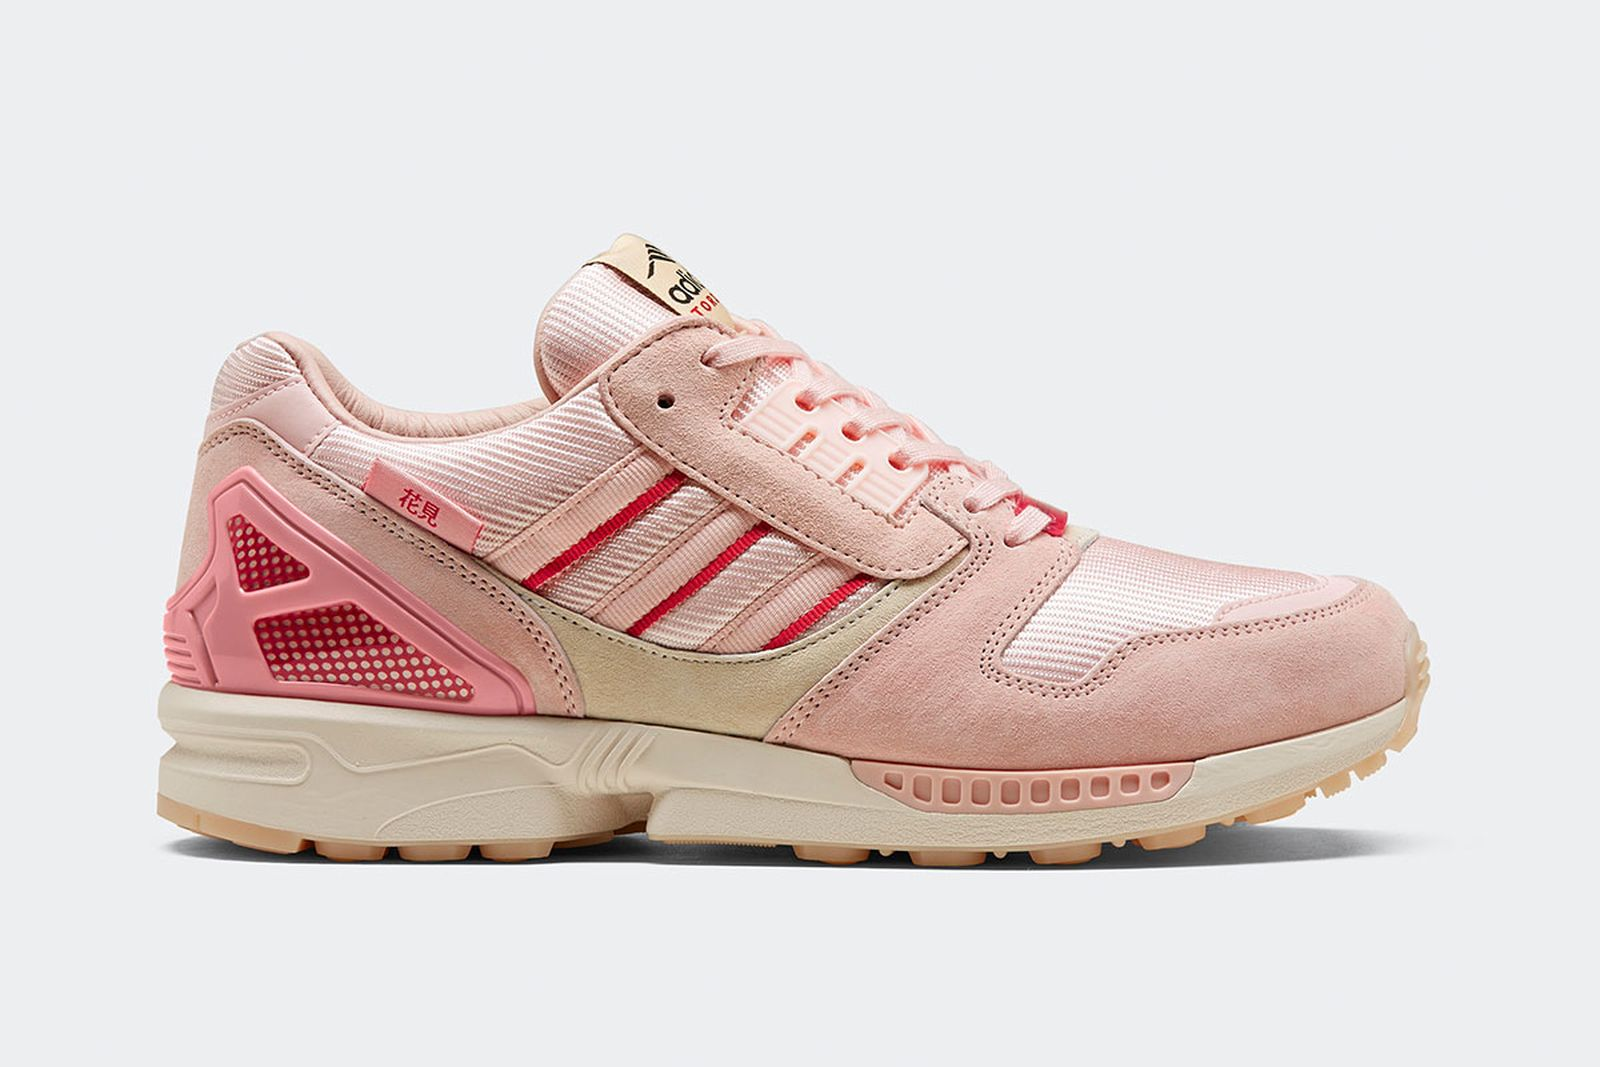 adidas-originals-zx-8000-kirschblutenallee-release-date-price-02